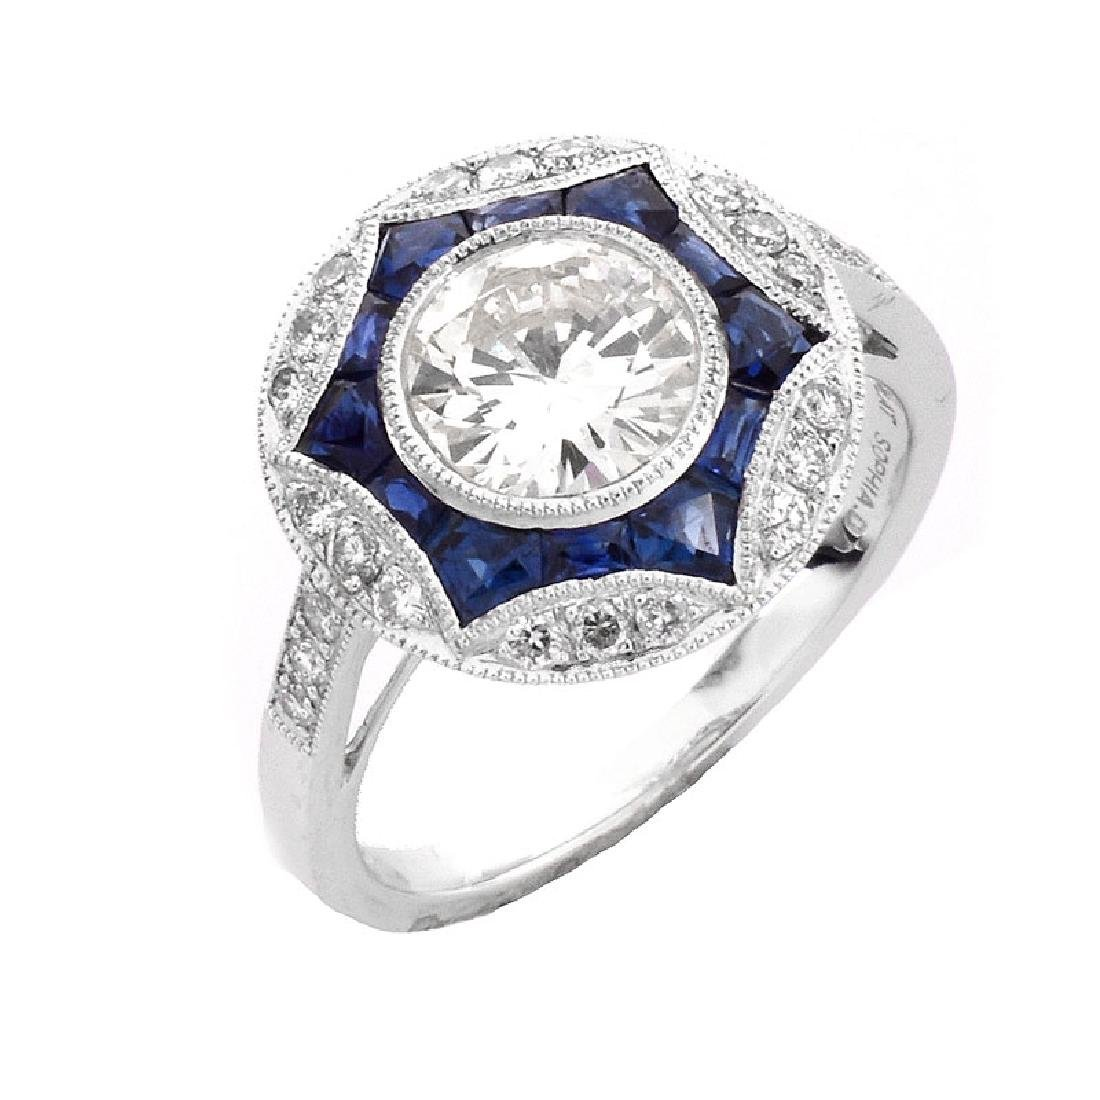 Art Deco style Approx. 1.20 Carat TW Diamond, .64 Carat